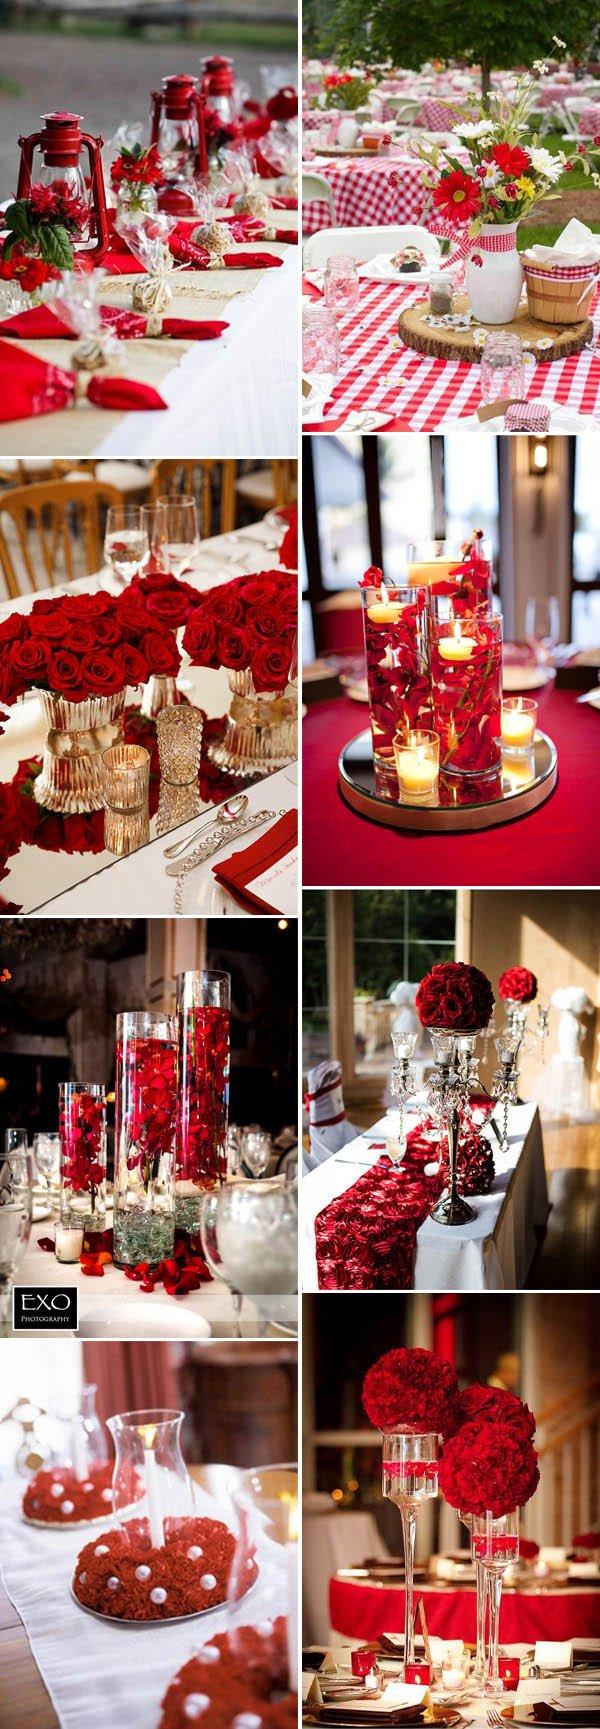 Wedding Decor Red and White Luxury 40 Inspirational Classic Red and White Wedding Ideas – Elegantweddinginvites Blog